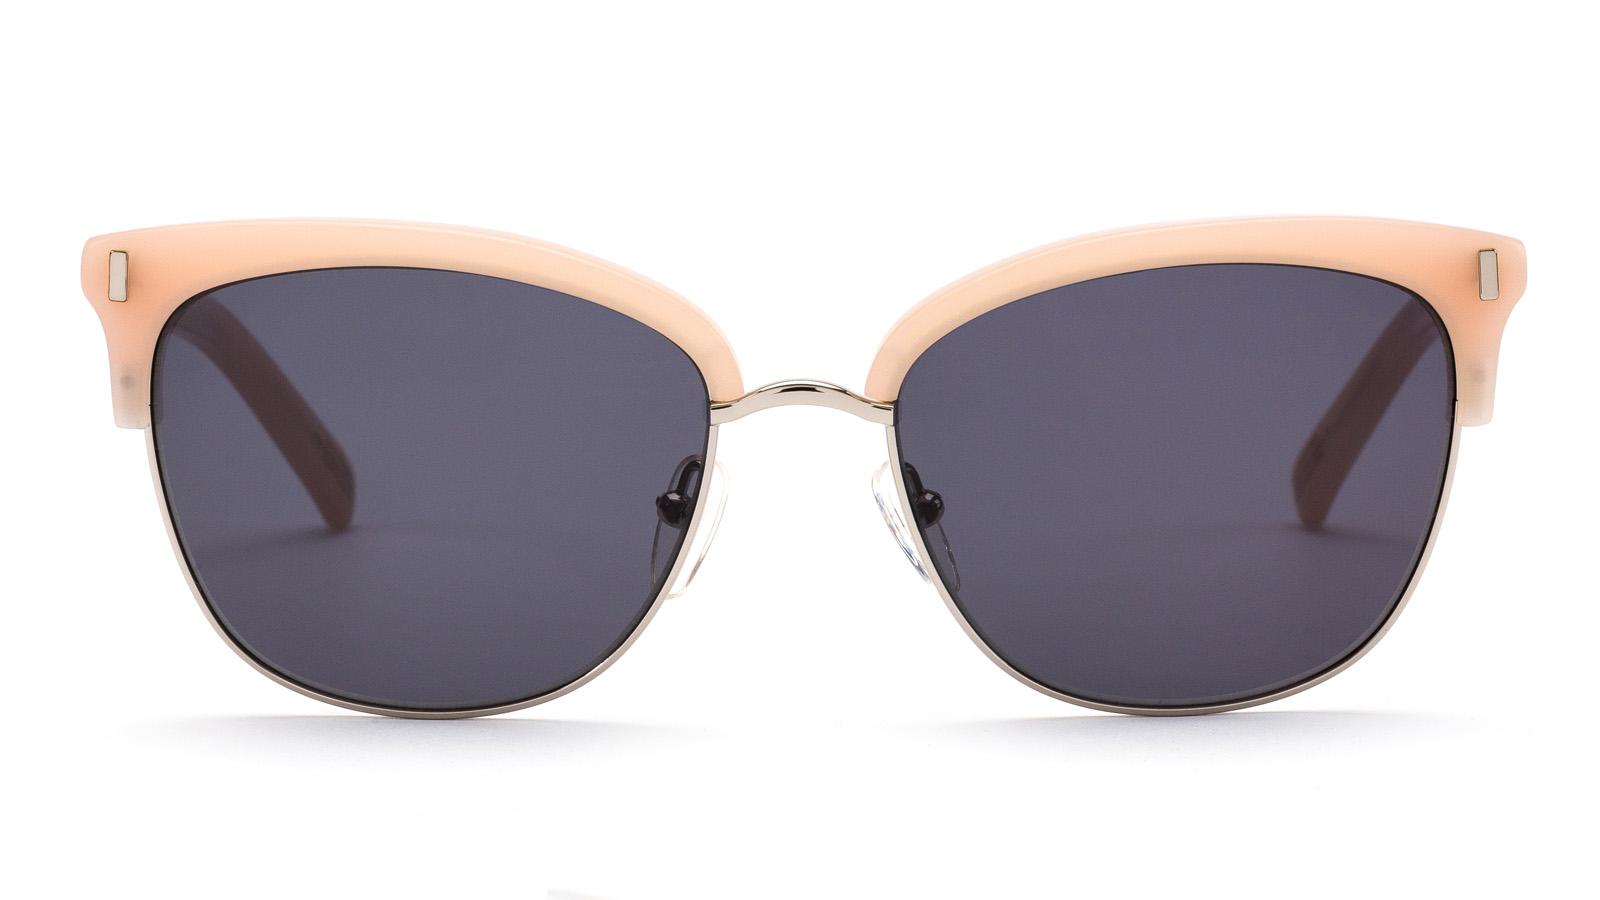 6eae043b0f Otis Sunglasses SS18 Preview - Boardsport SOURCE